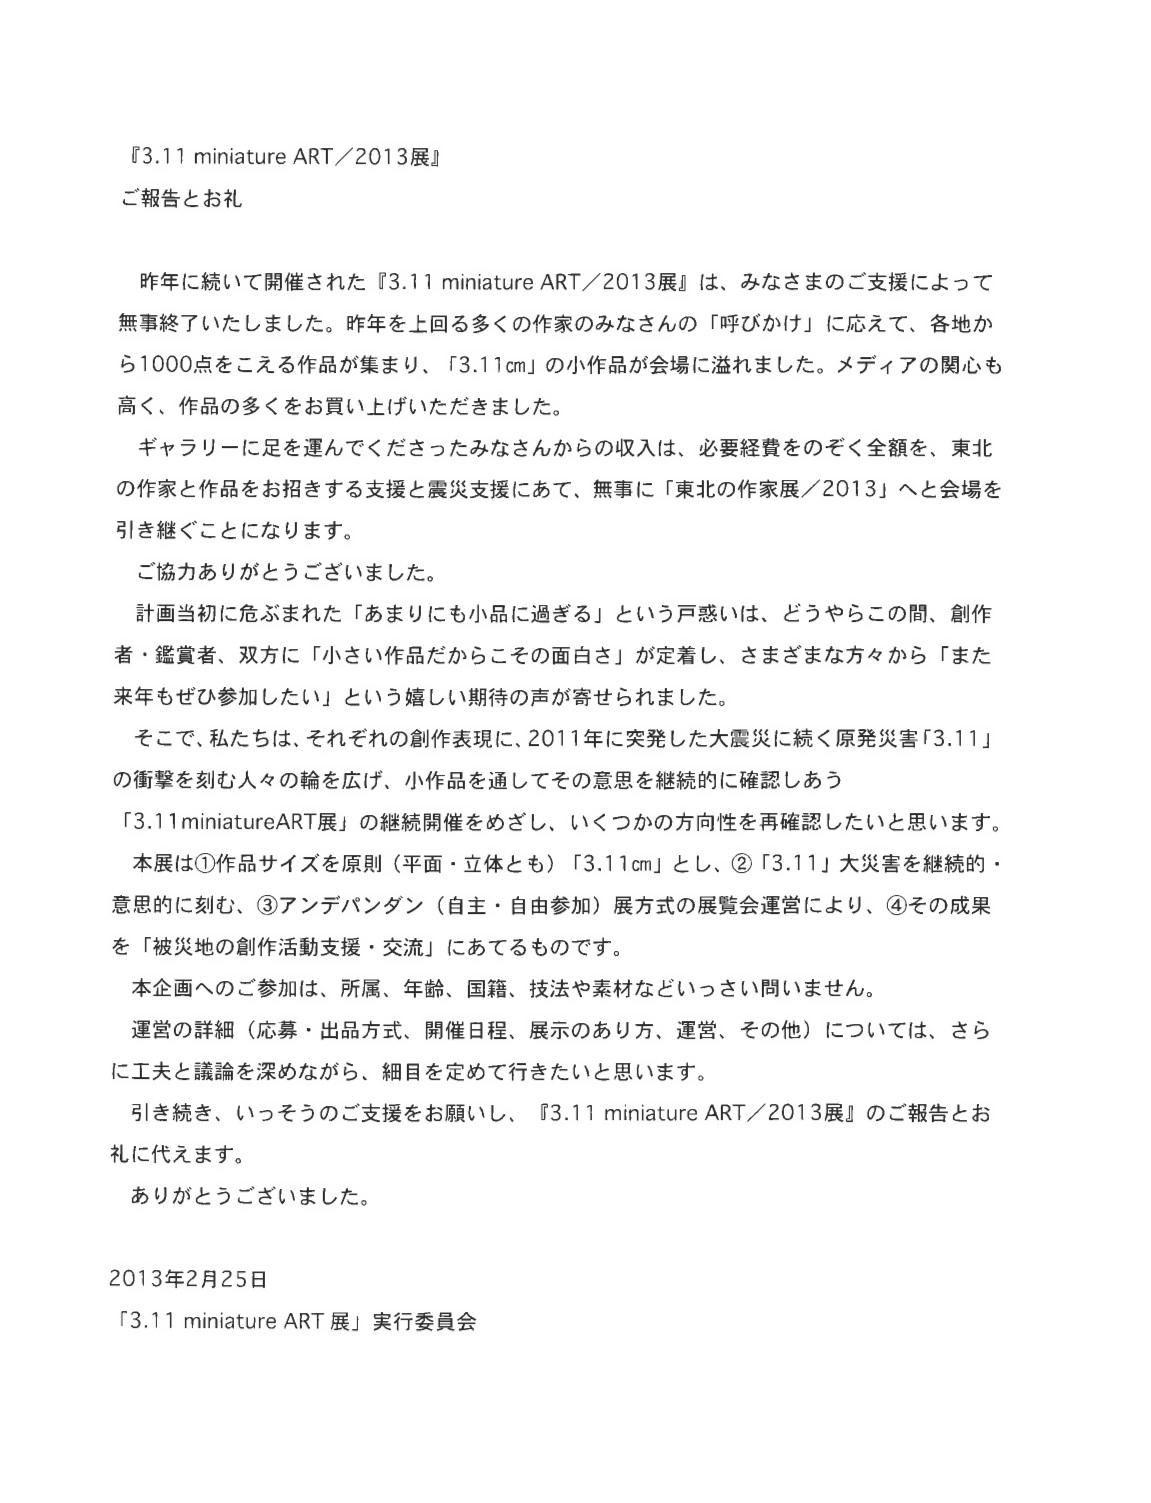 3.11ART2013報告とお礼